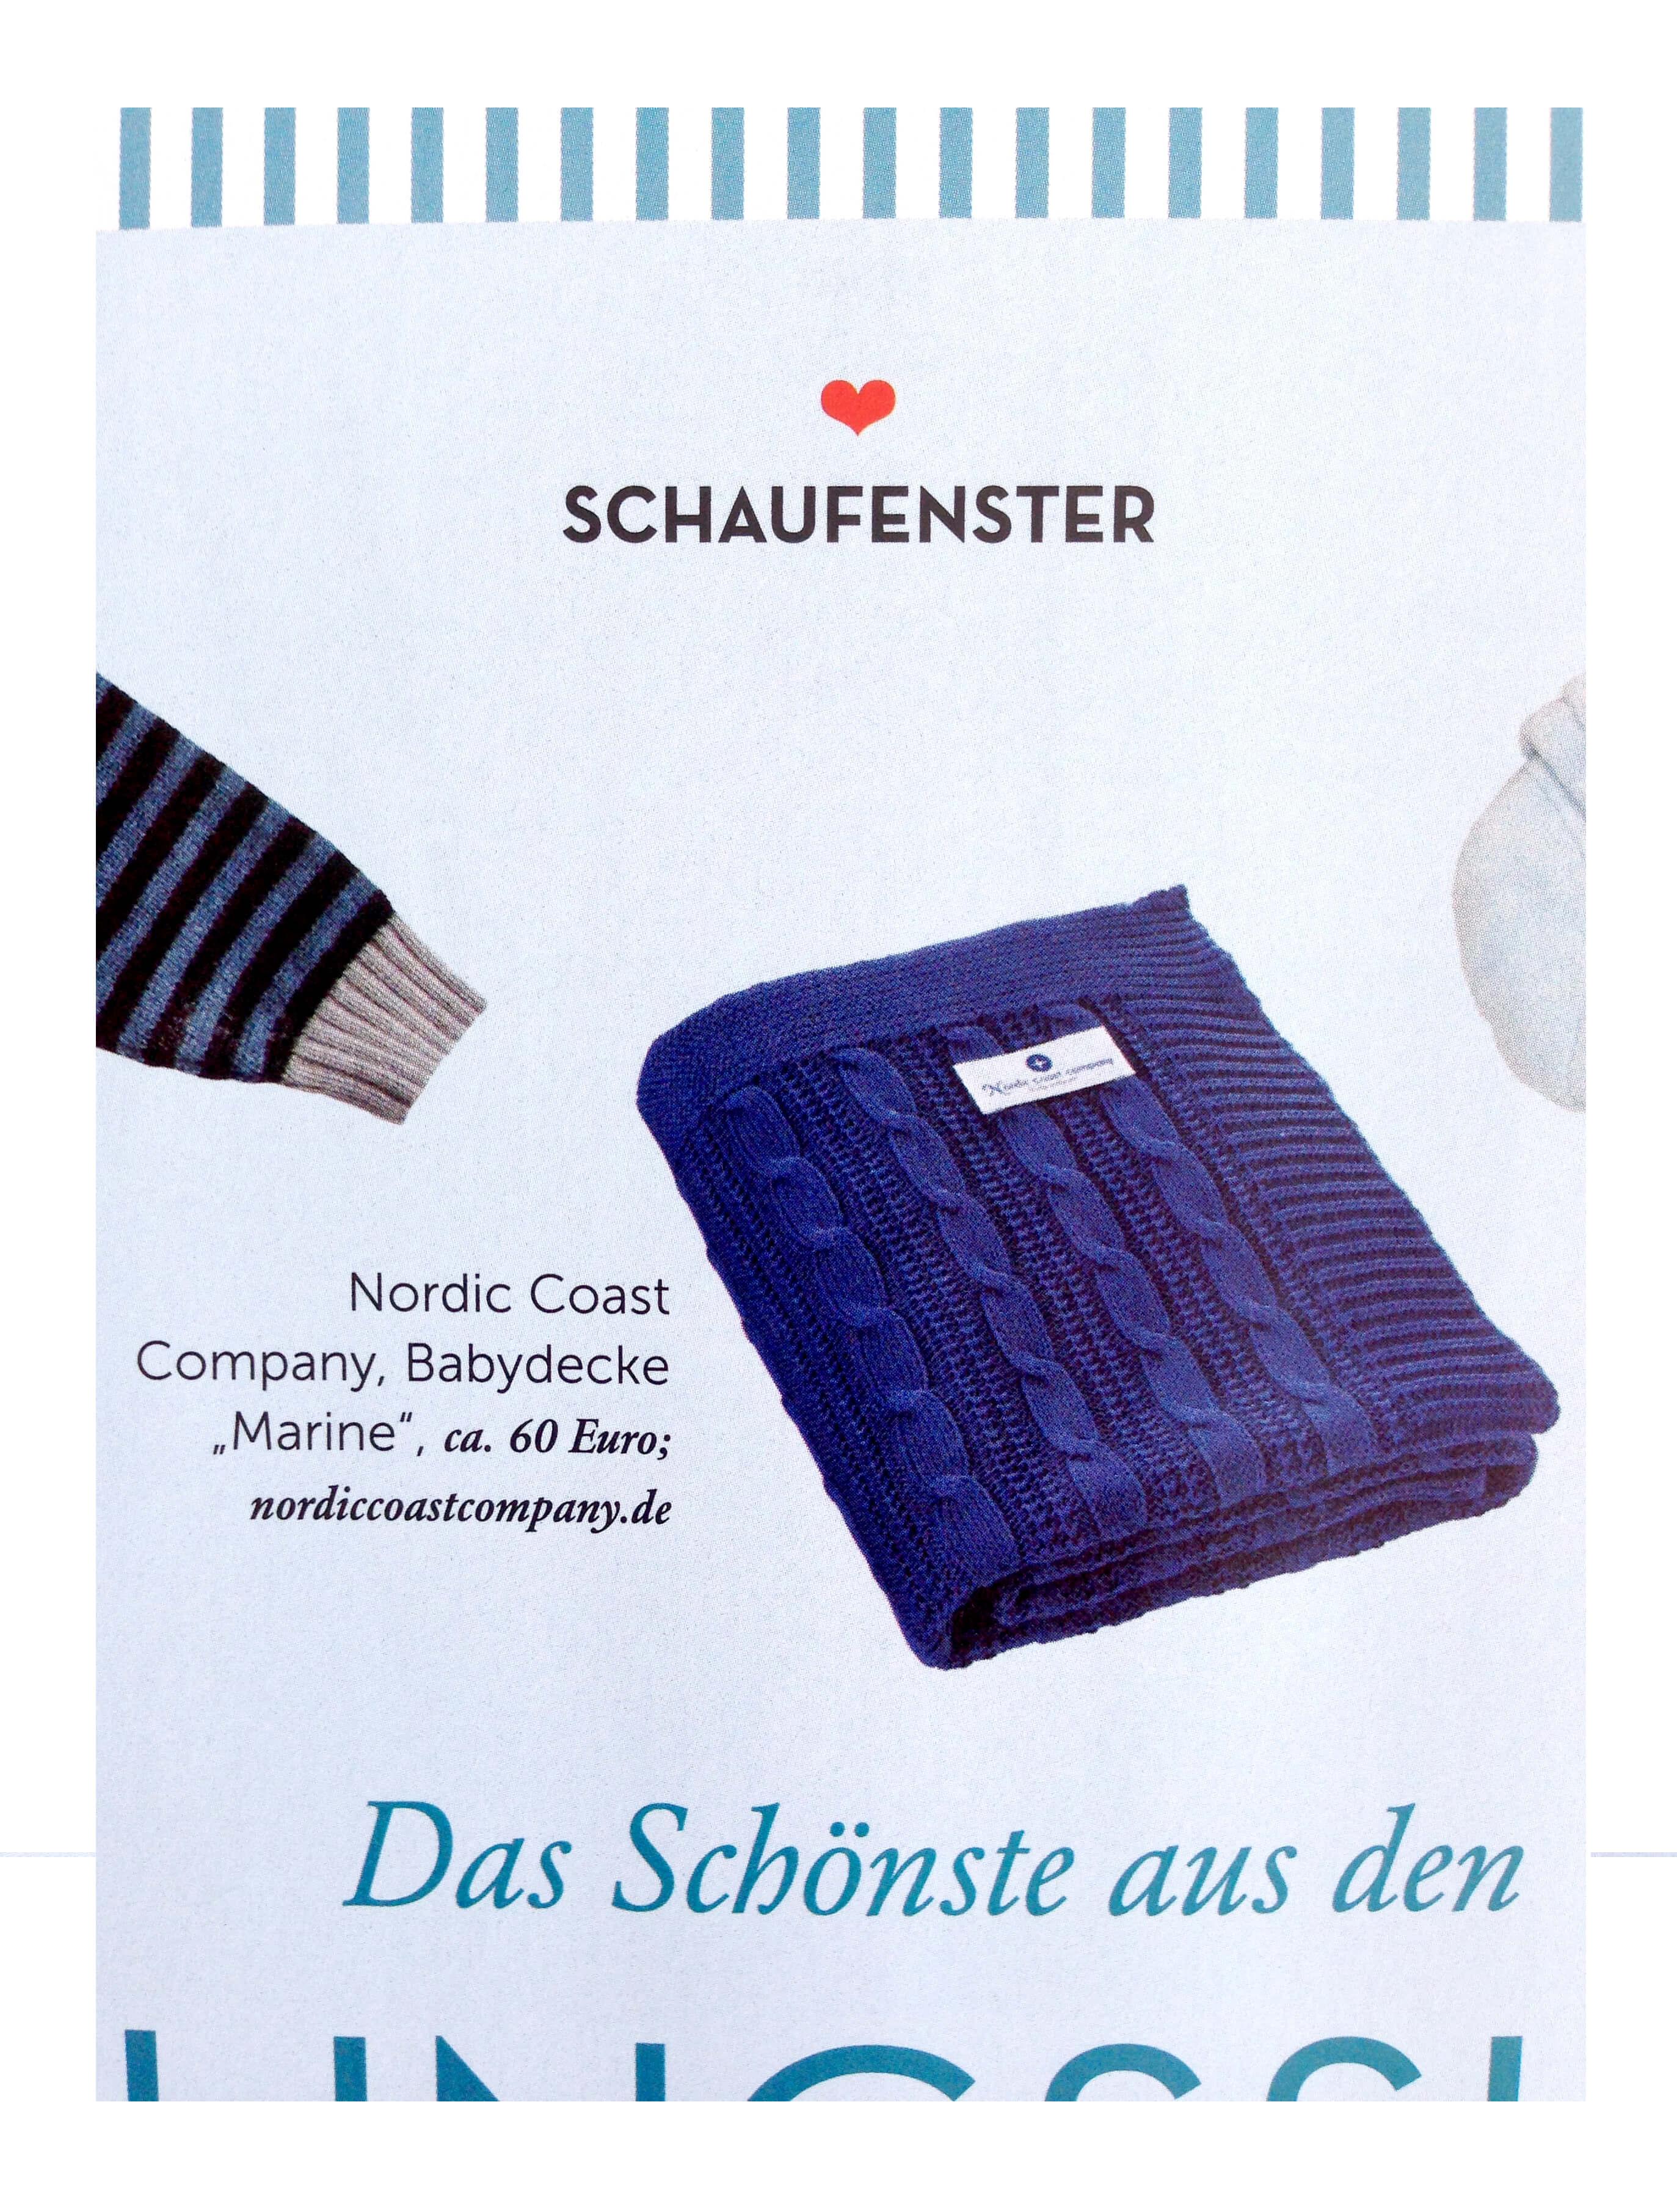 Mum_Schaufenster Auslobung_nordiccoastcompany